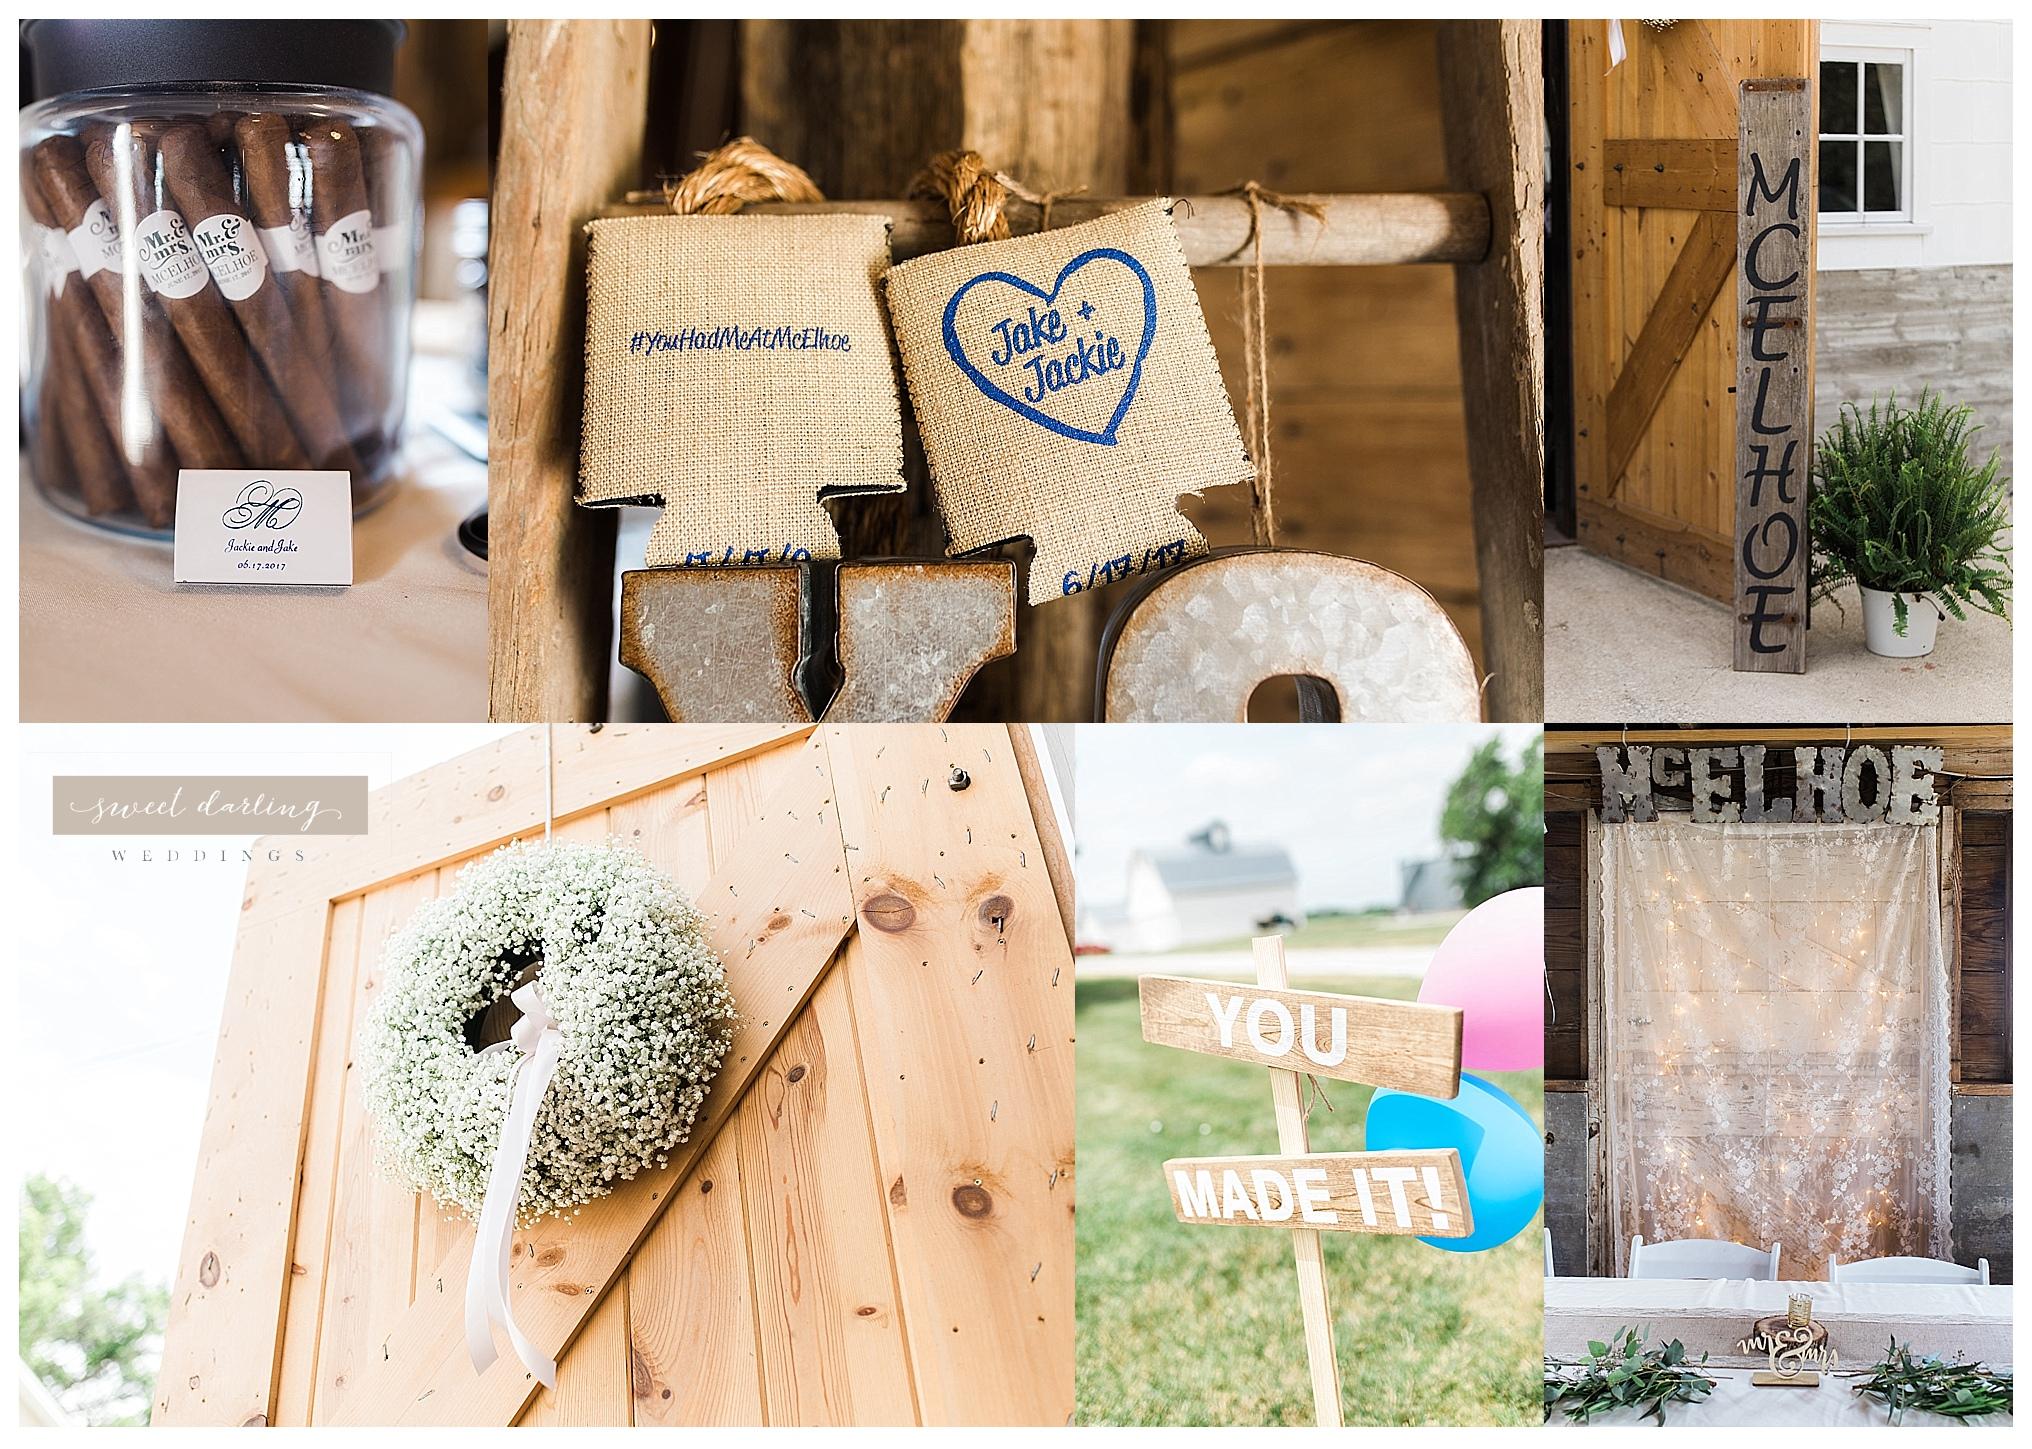 Rpaxton-illinois-engelbrecht-farm-country-wedding-photographer-sweet-darling-weddings_1259.jpg